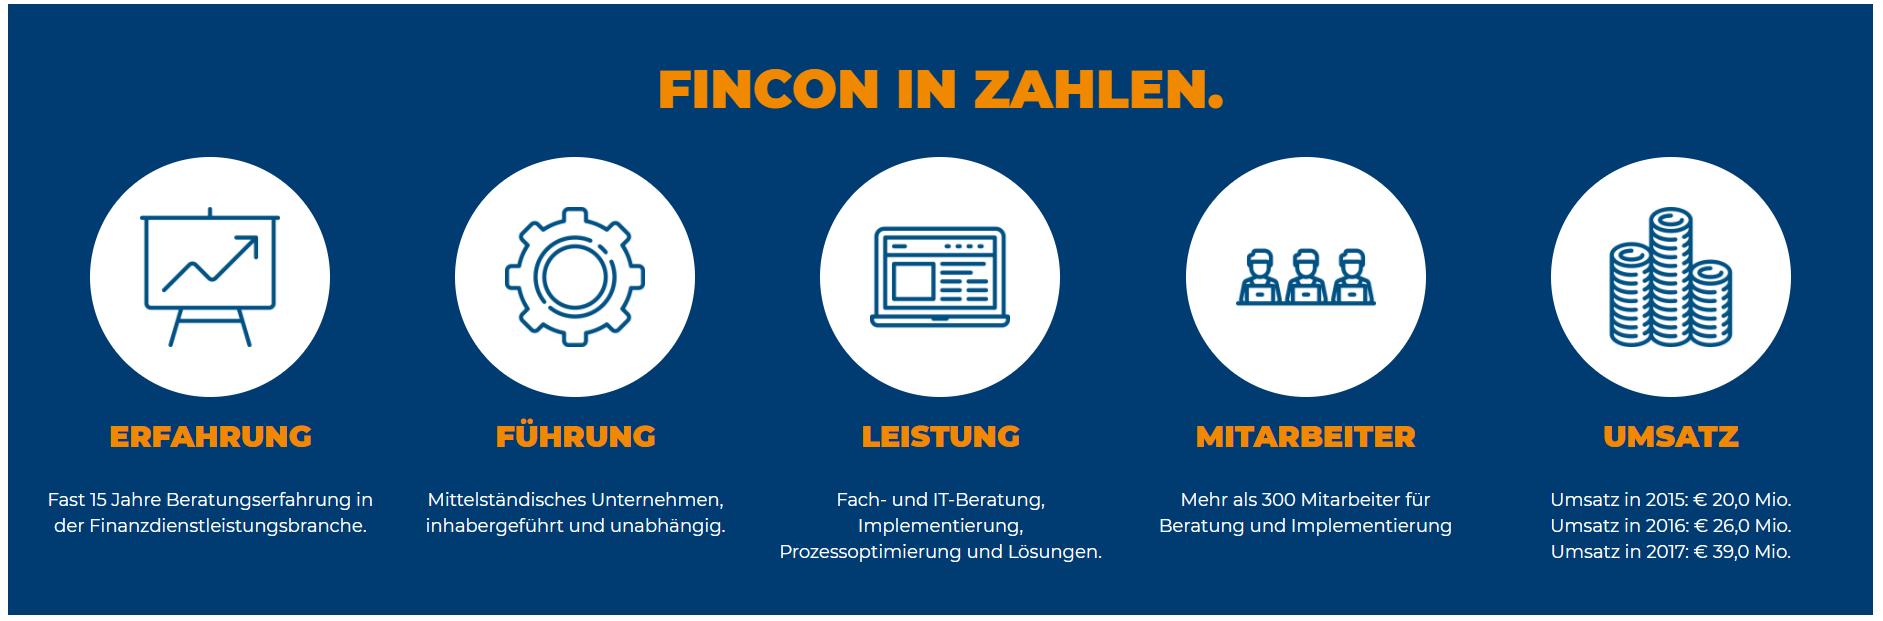 fincon-zahlen